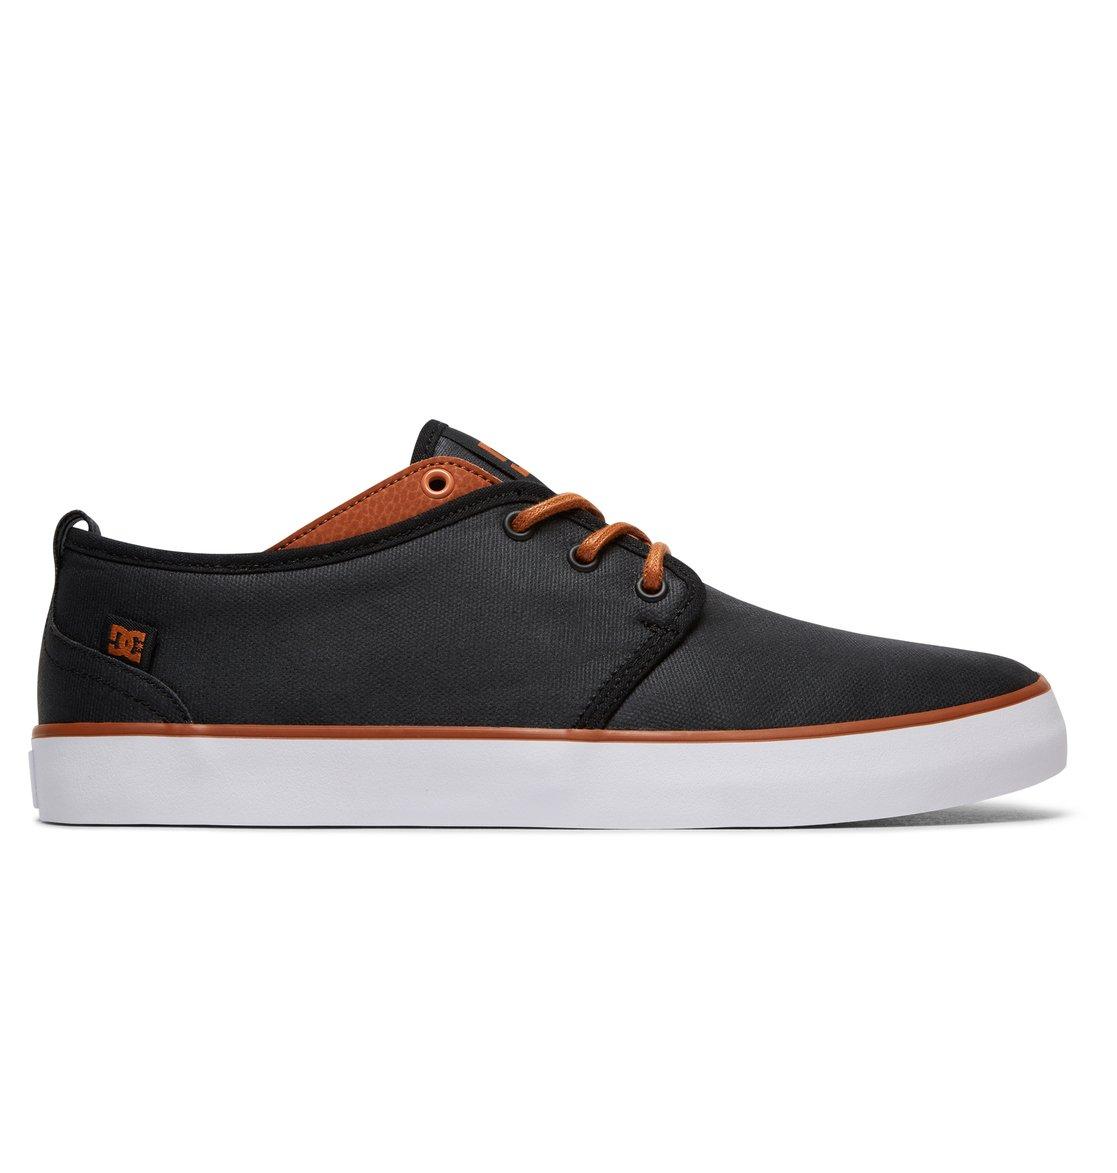 dc shoes Studio 2 TX SE - Scarpe da Uomo - Black - DC Shoes FBZZbpud